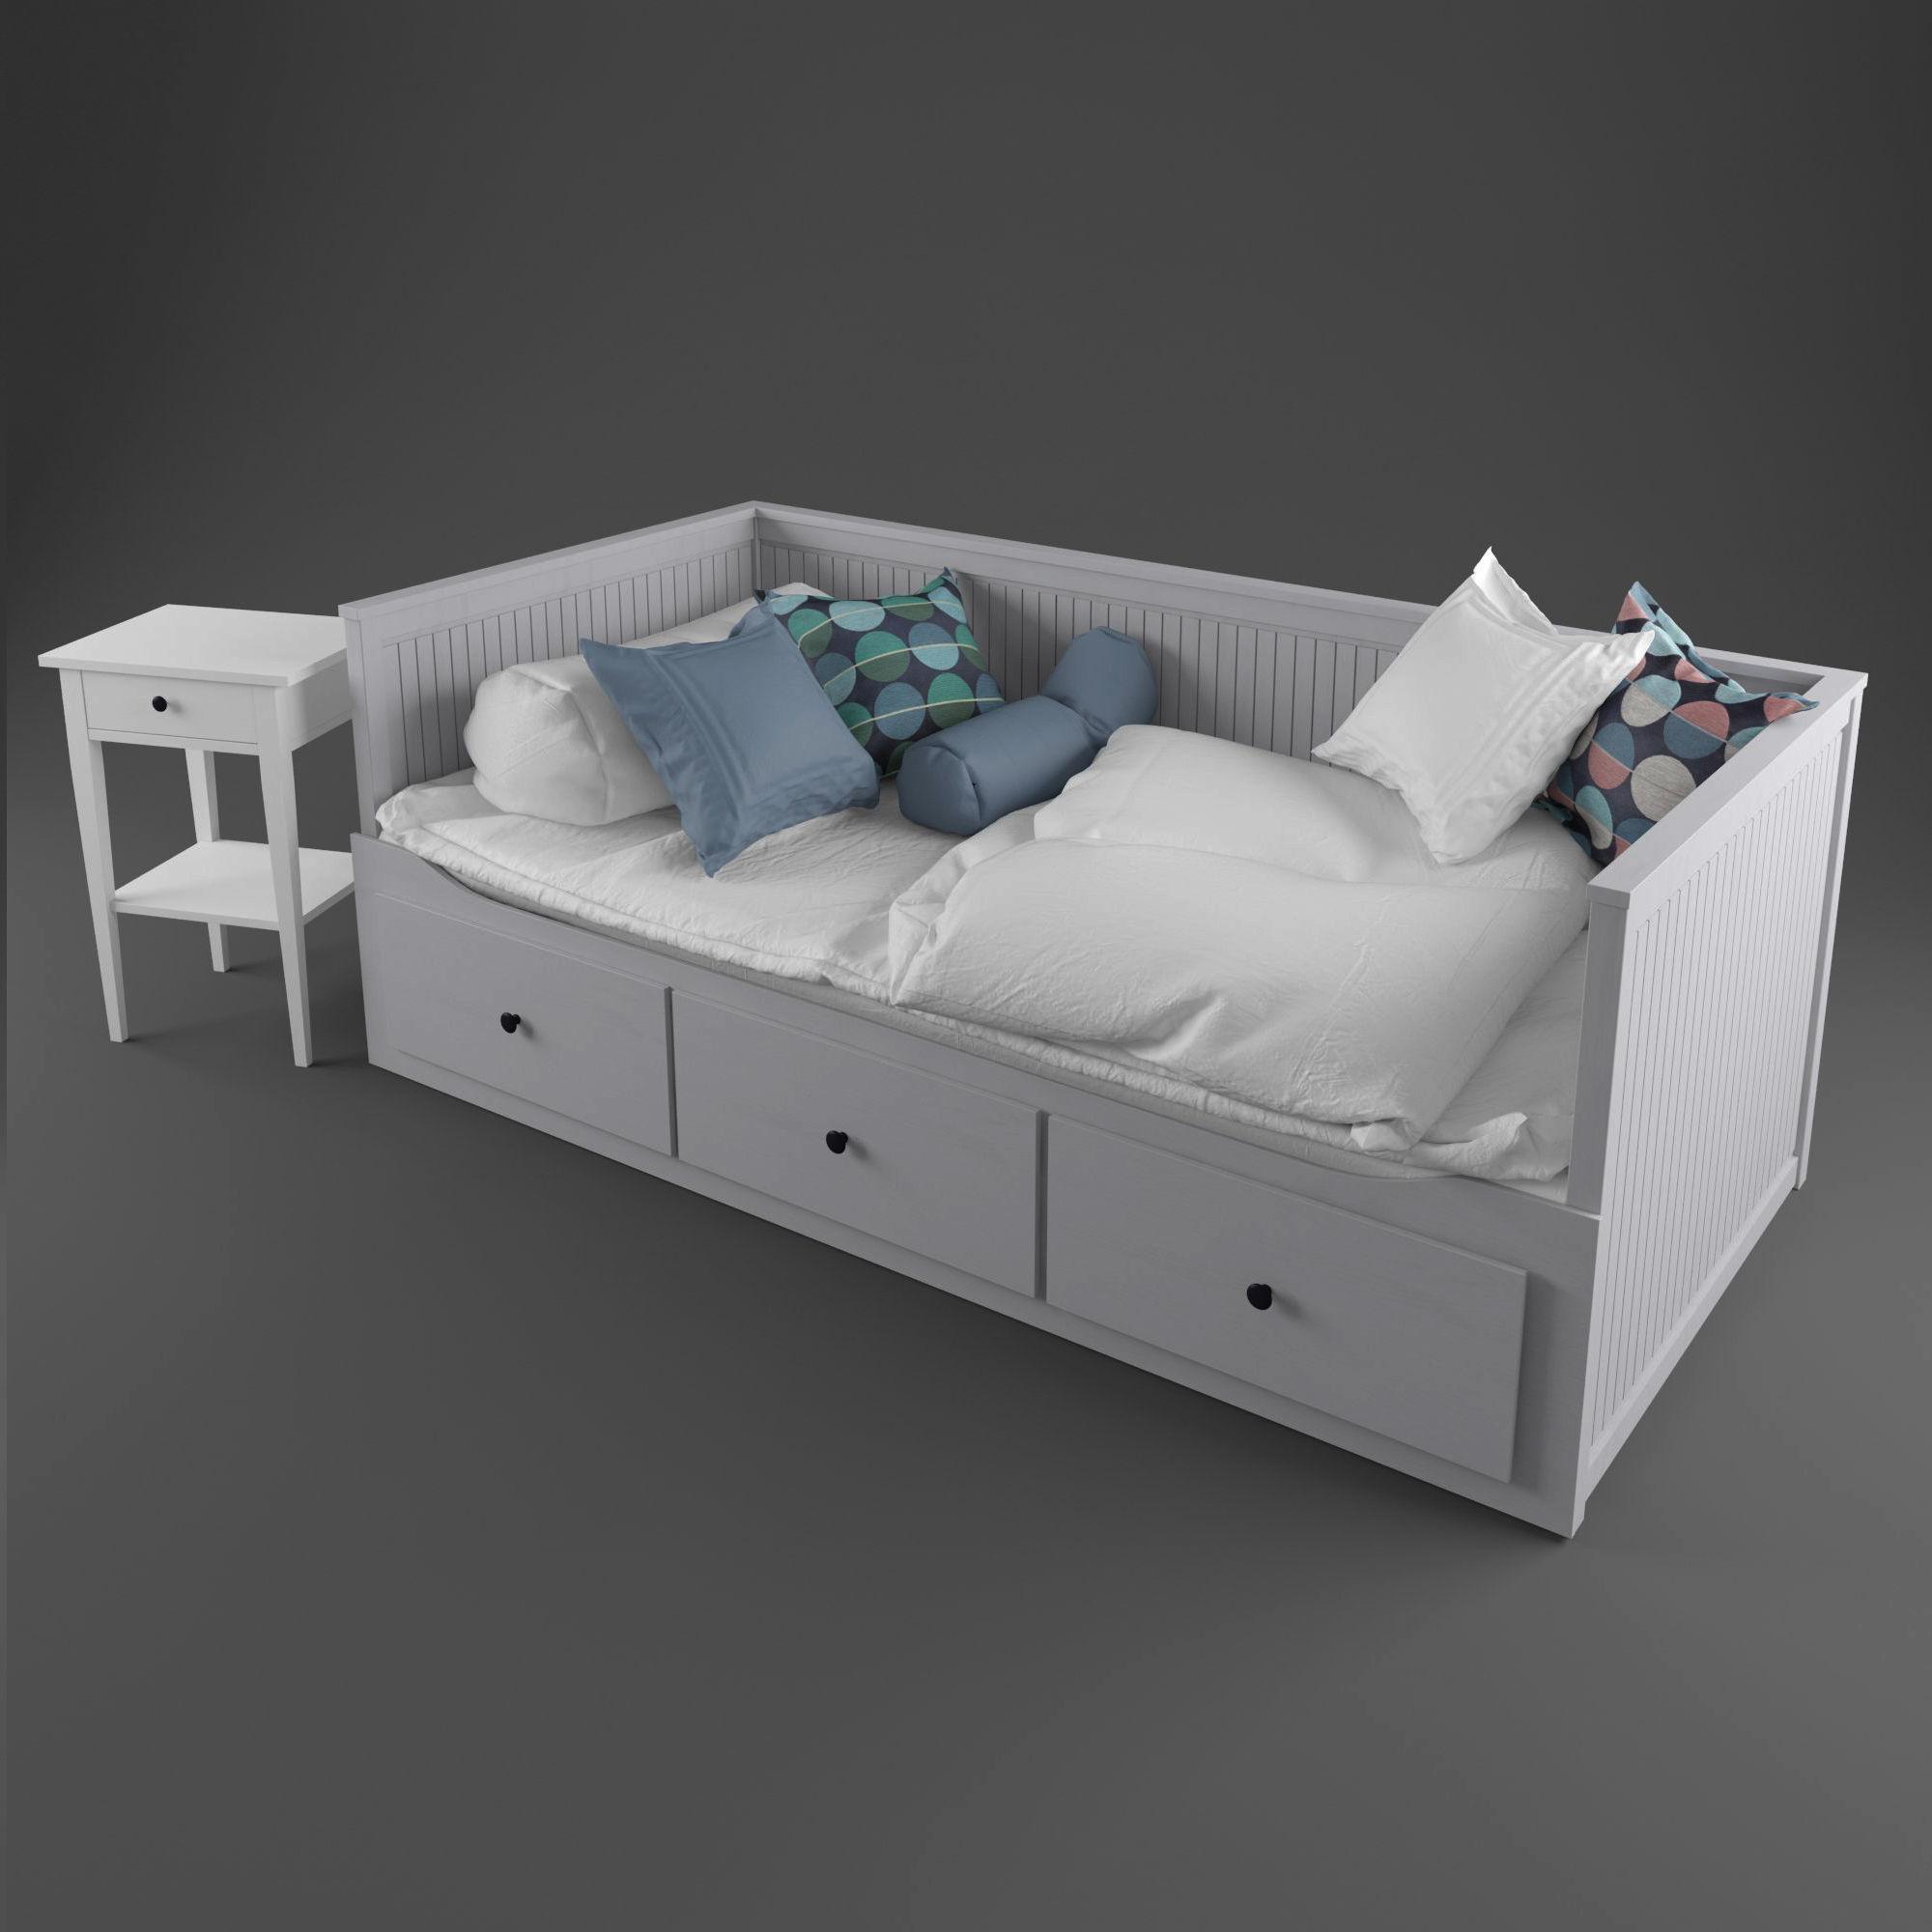 Carpet Ikea Hemnes Bed 2 3d Model Cgtrader